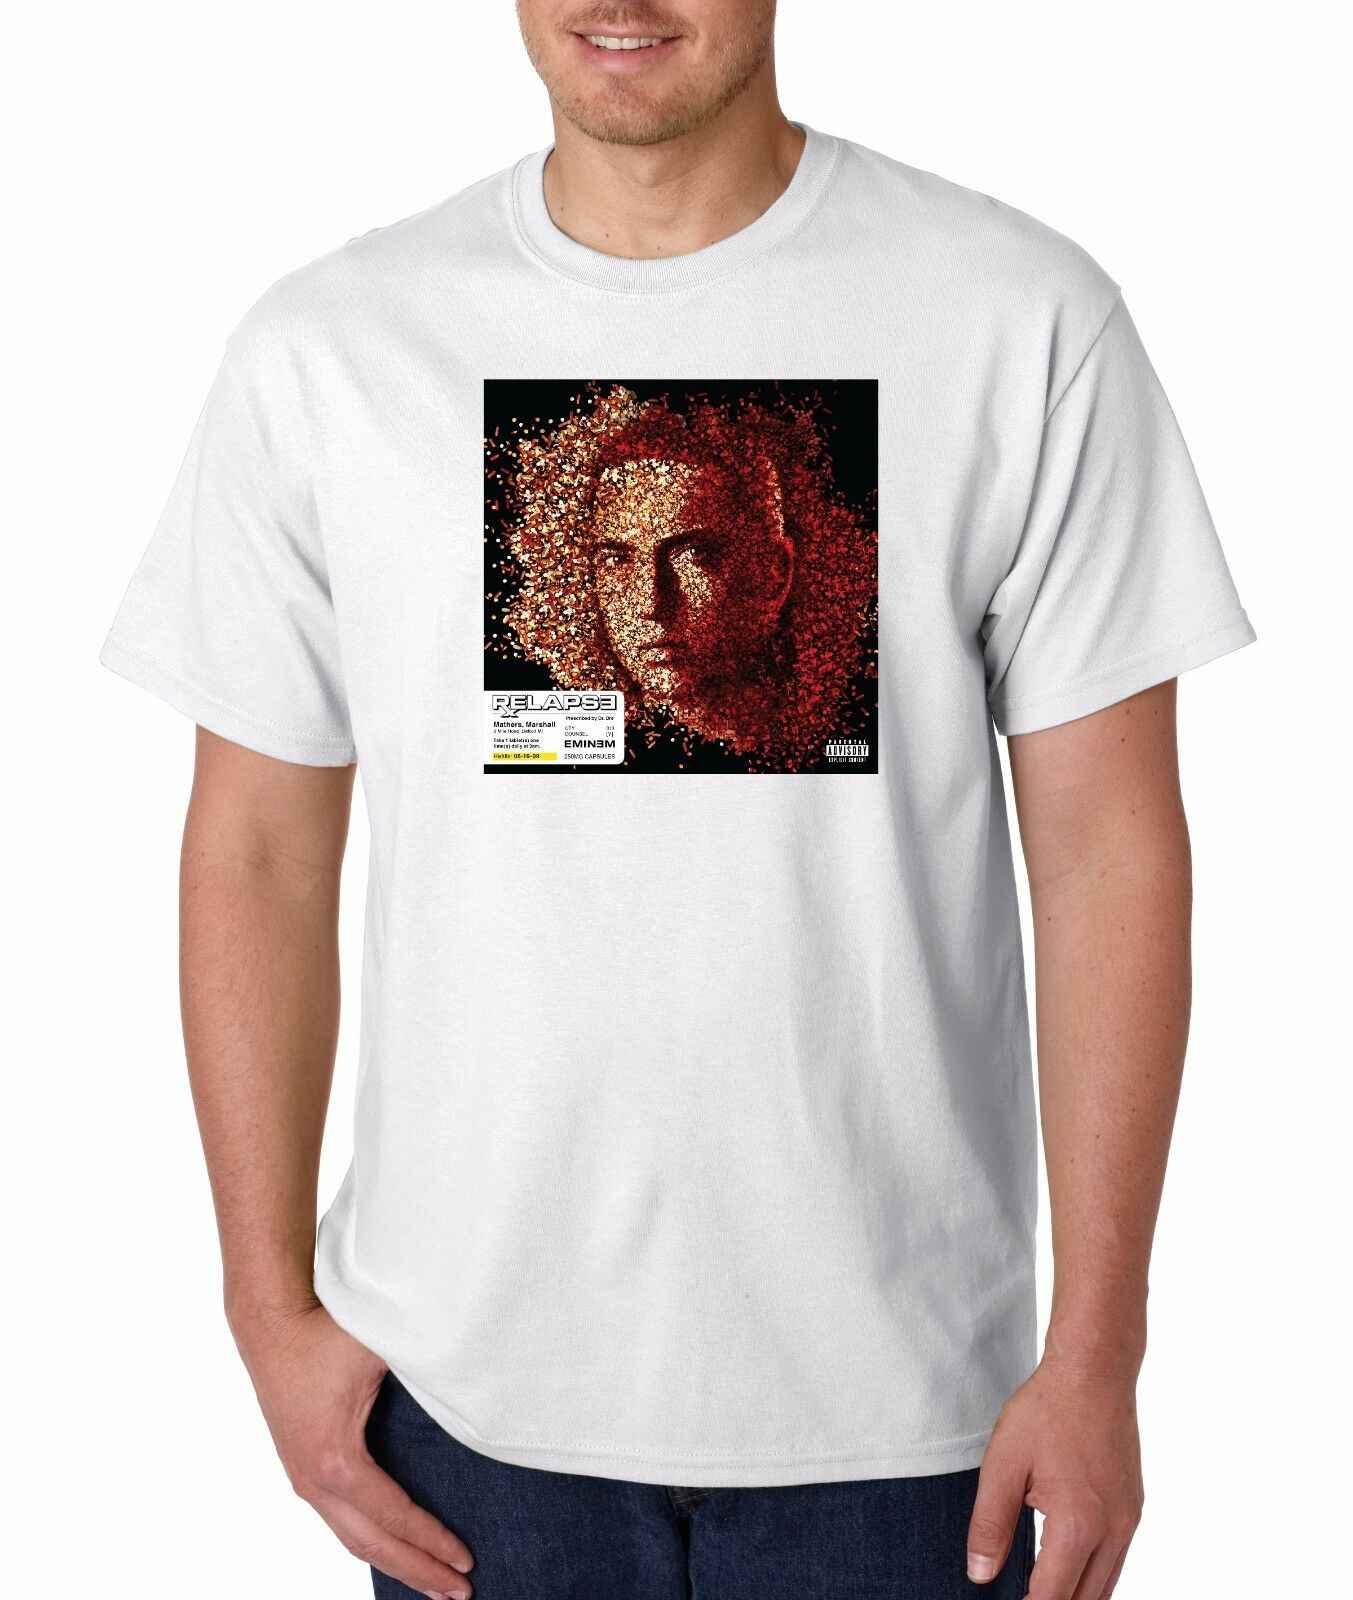 Eminem Terugval T-shirt Klassieke Hip Hop Tee Rap Slim Shady Revival Rap God Nieuwe Zomer Men'S fashion Tee, comfortabele t-shirt